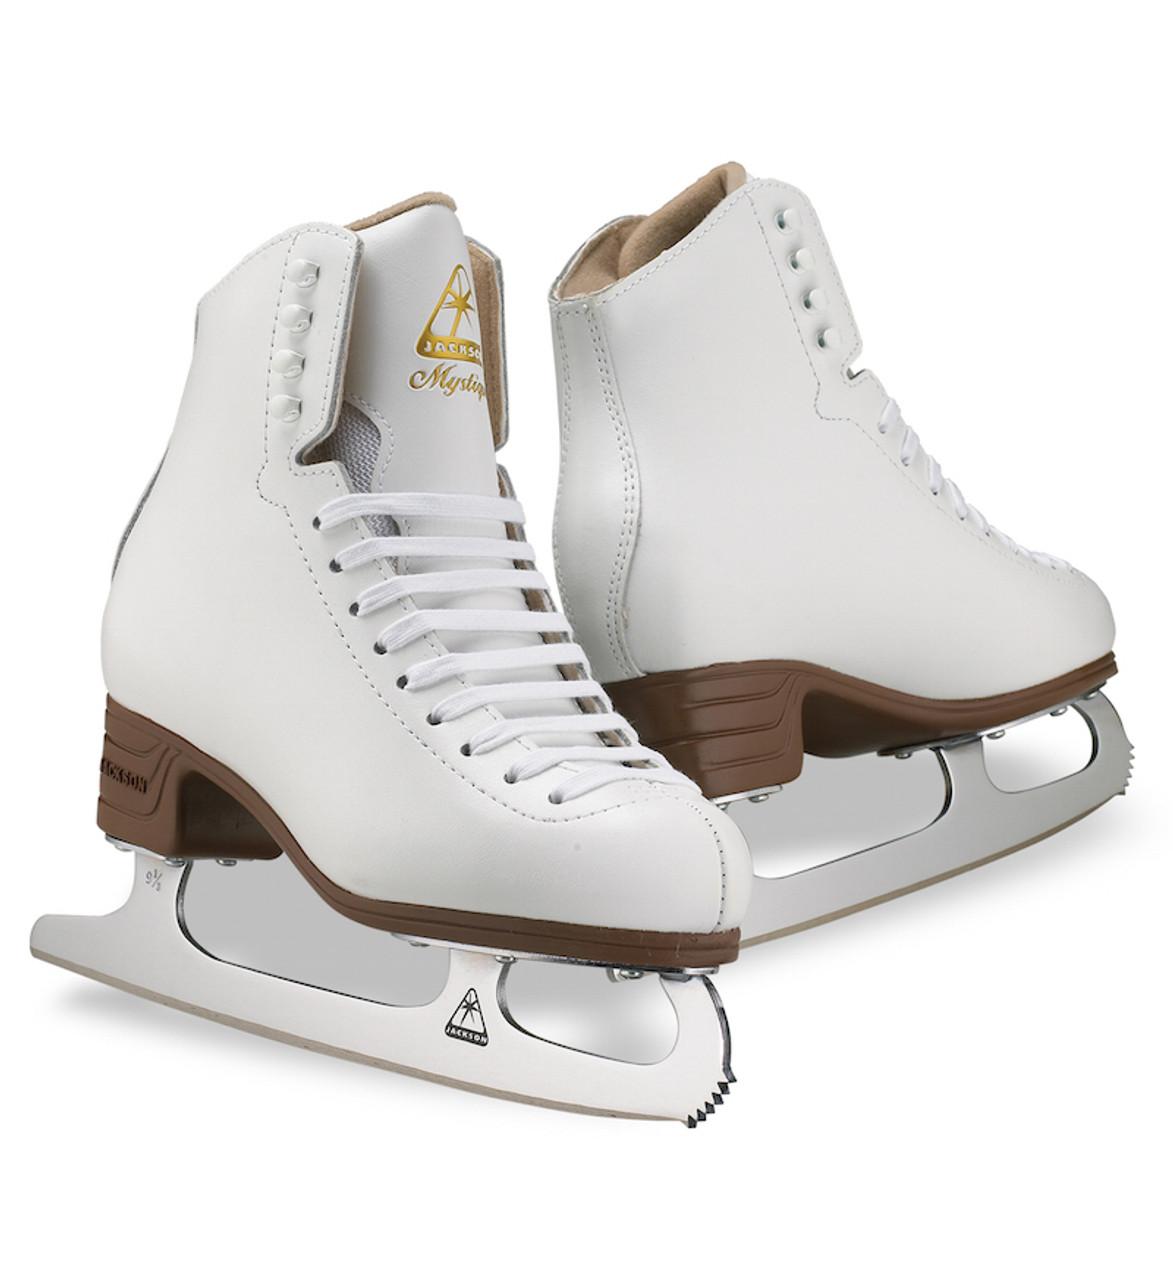 Jackson Mystique Girls  Figure Skates w/Mark II blade JS1491